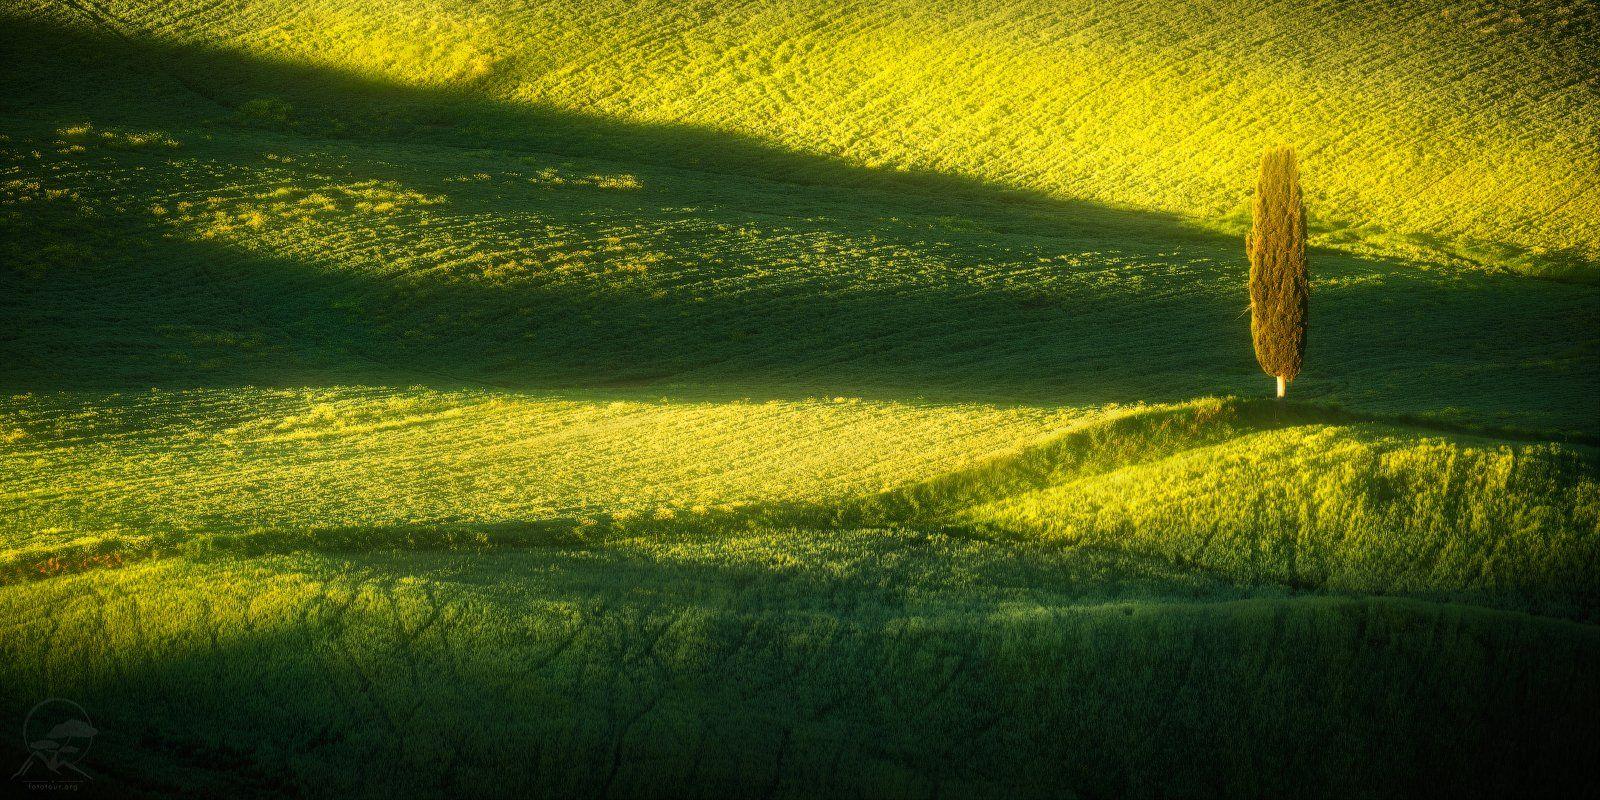 пейзаж, природа, тоскана, италия, весна, Гордиенко Анатолий